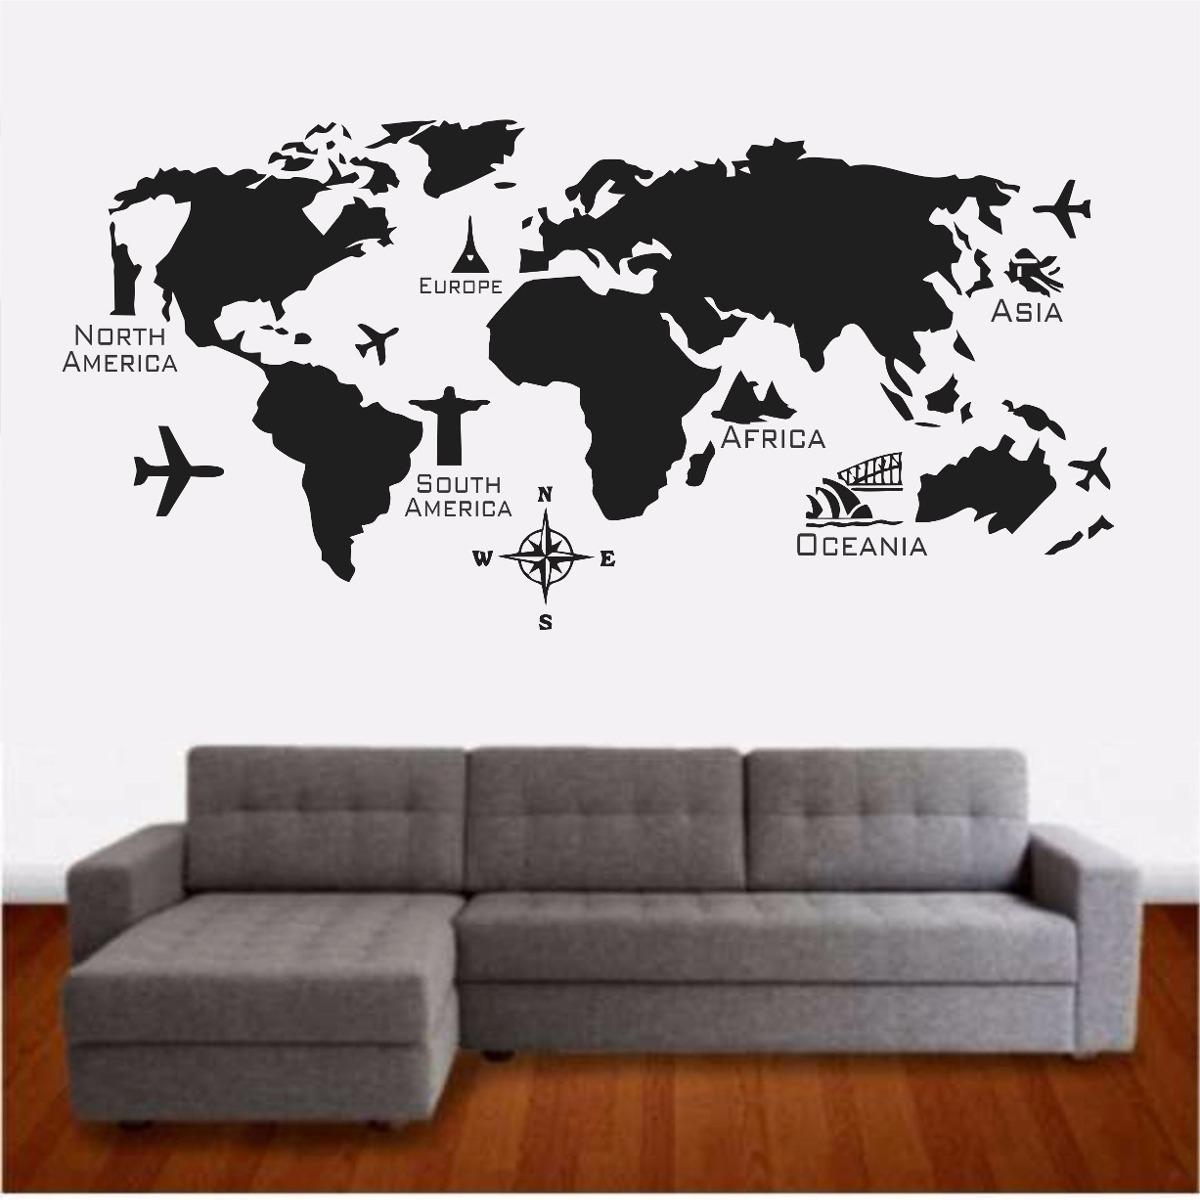 Adesivo De Parede Espelhado ~ Adesivo Parede Mapa Mundi Continentes Viagem Europa Asia